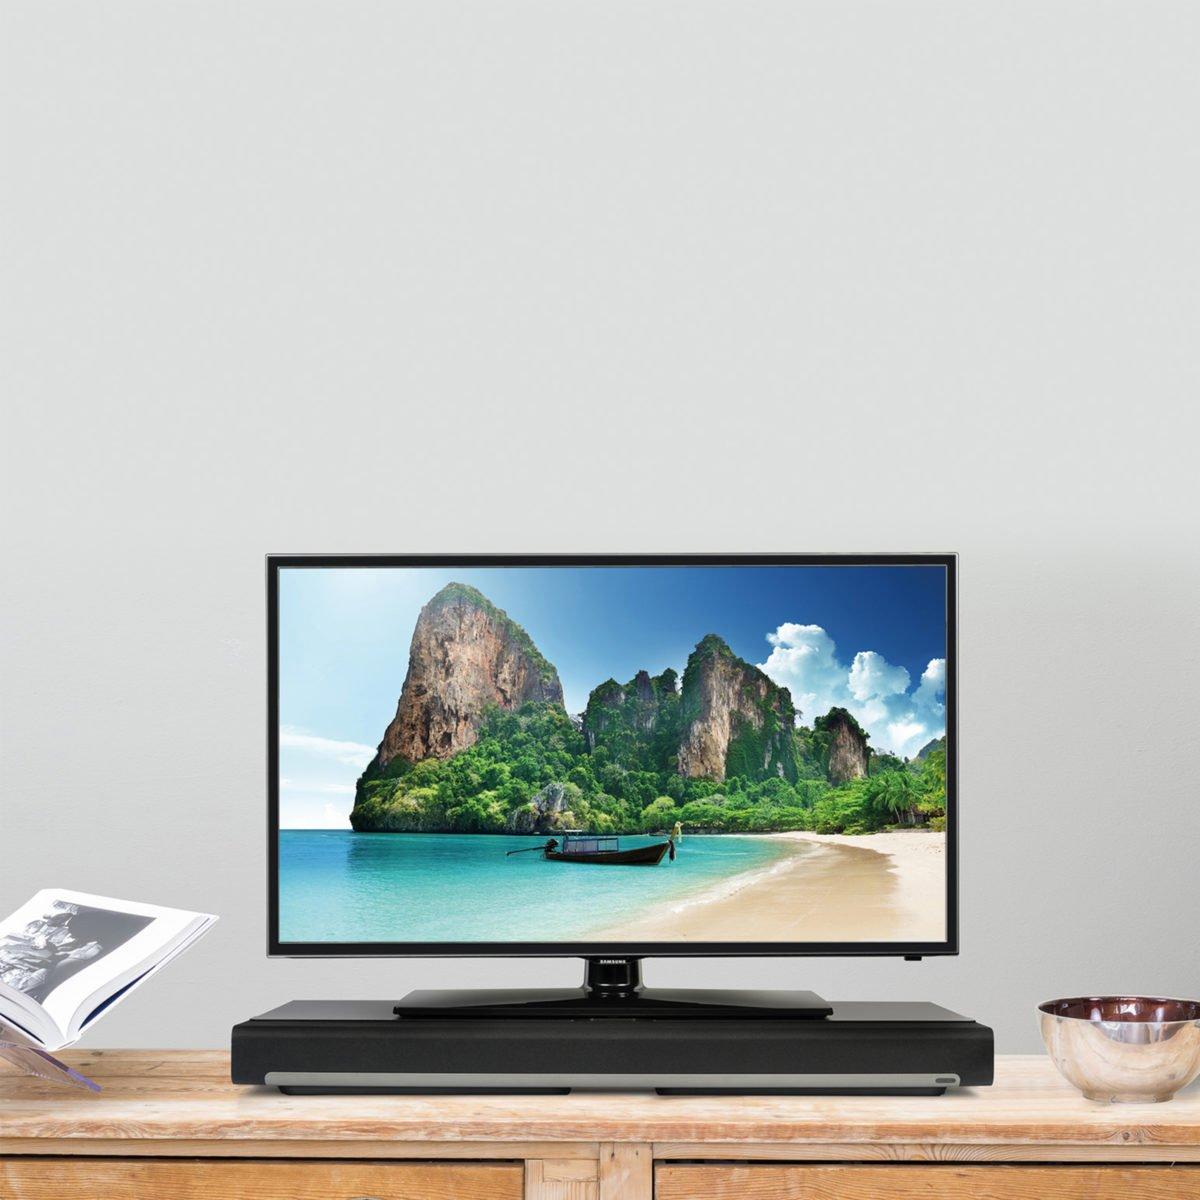 sonos playbar tv stand